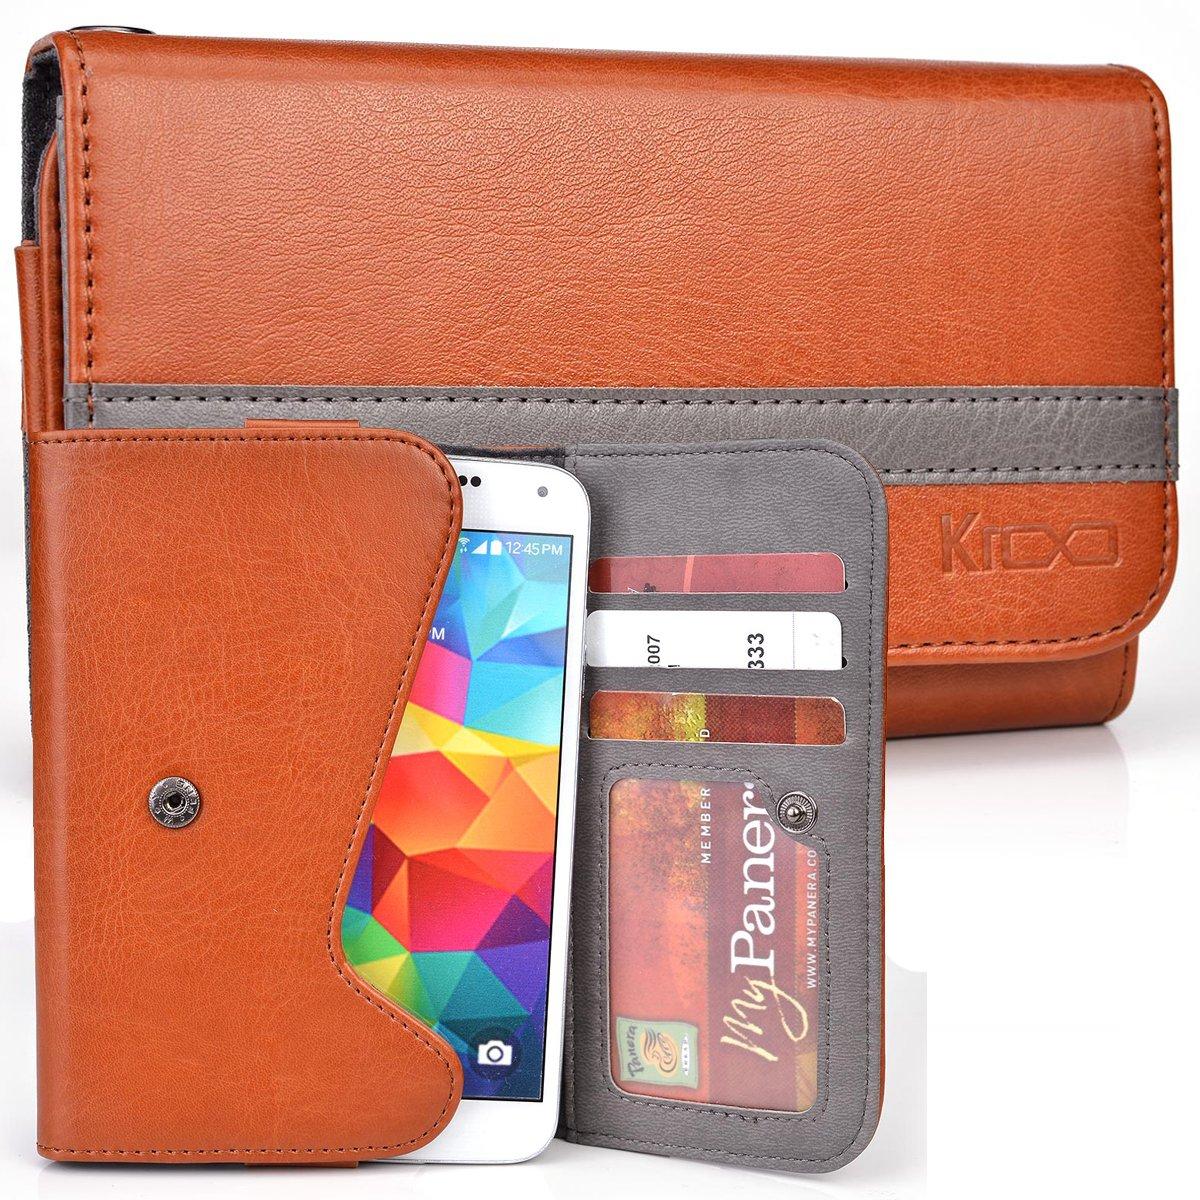 Sharp Aquos Mini Shl24 Phone Xx 303sh Case Cadmium Orange Two Tone Bifold Wallet With Belt Loop Cell Phones Accessories